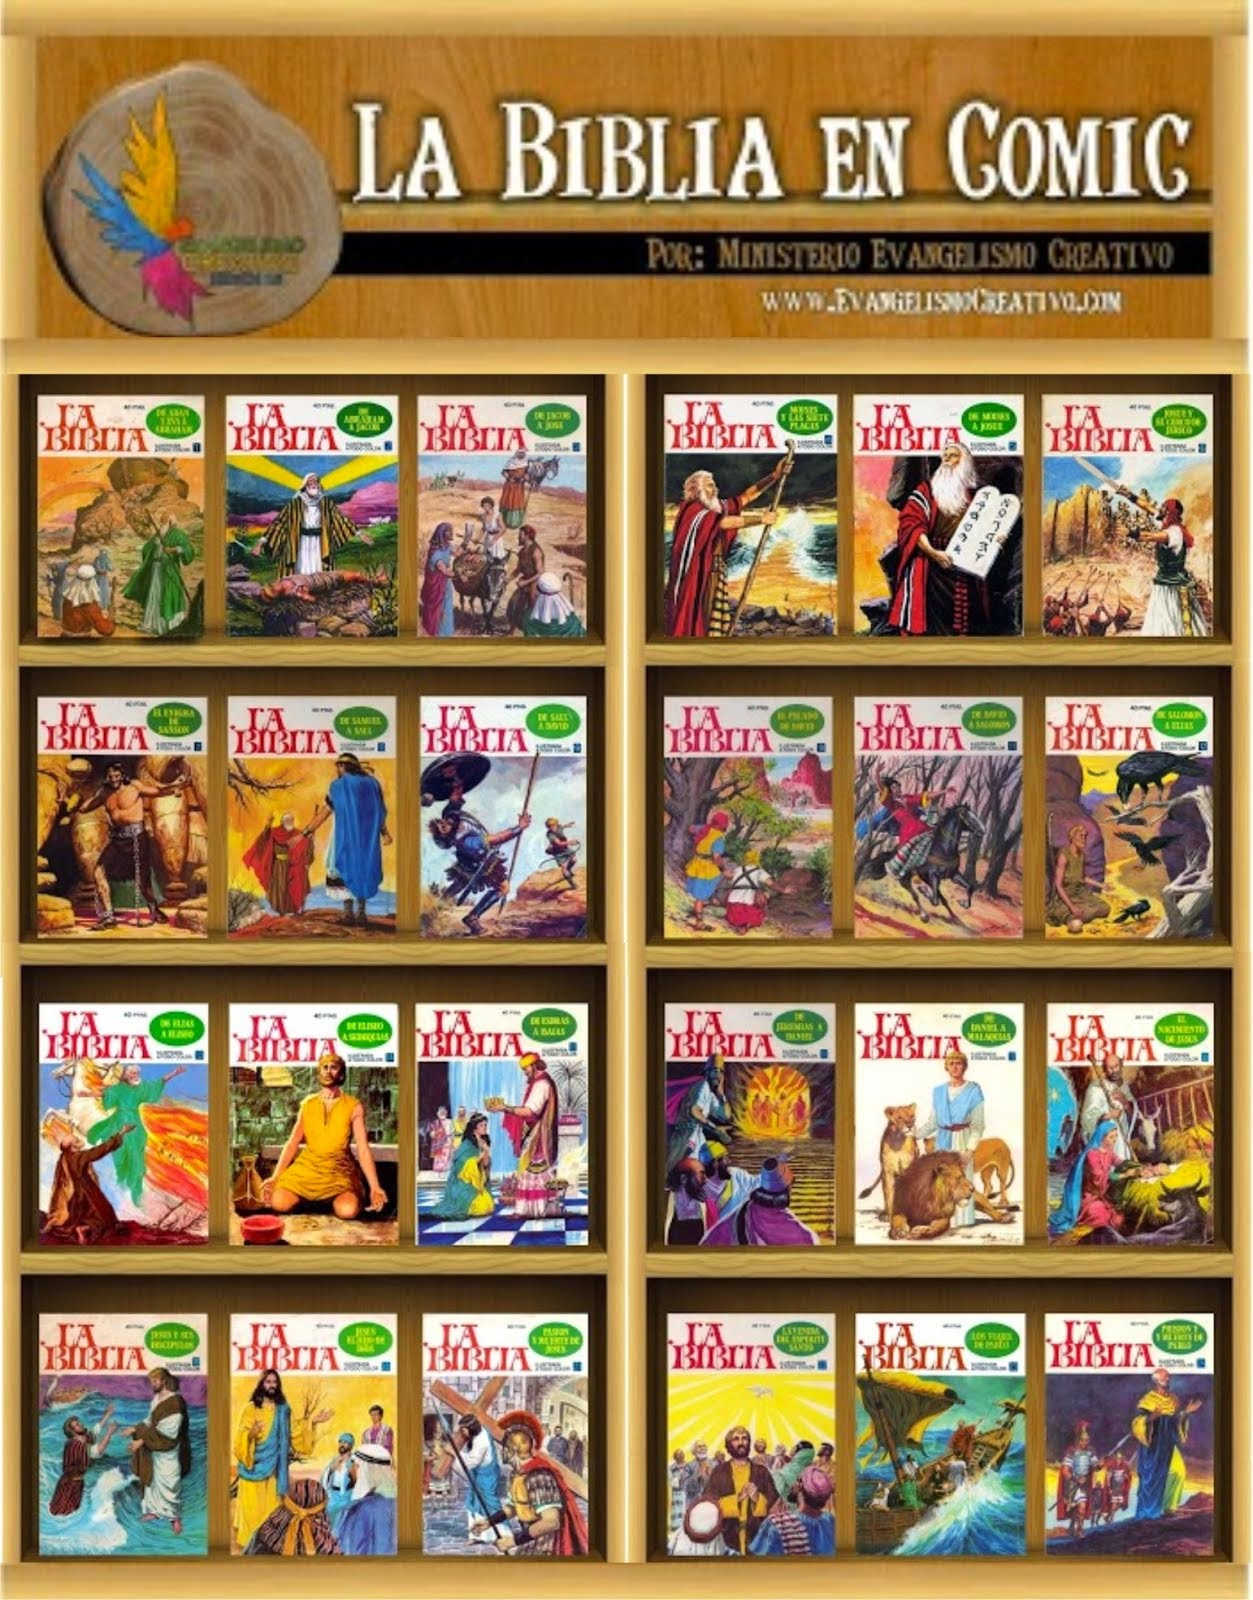 La Biblia en Comic